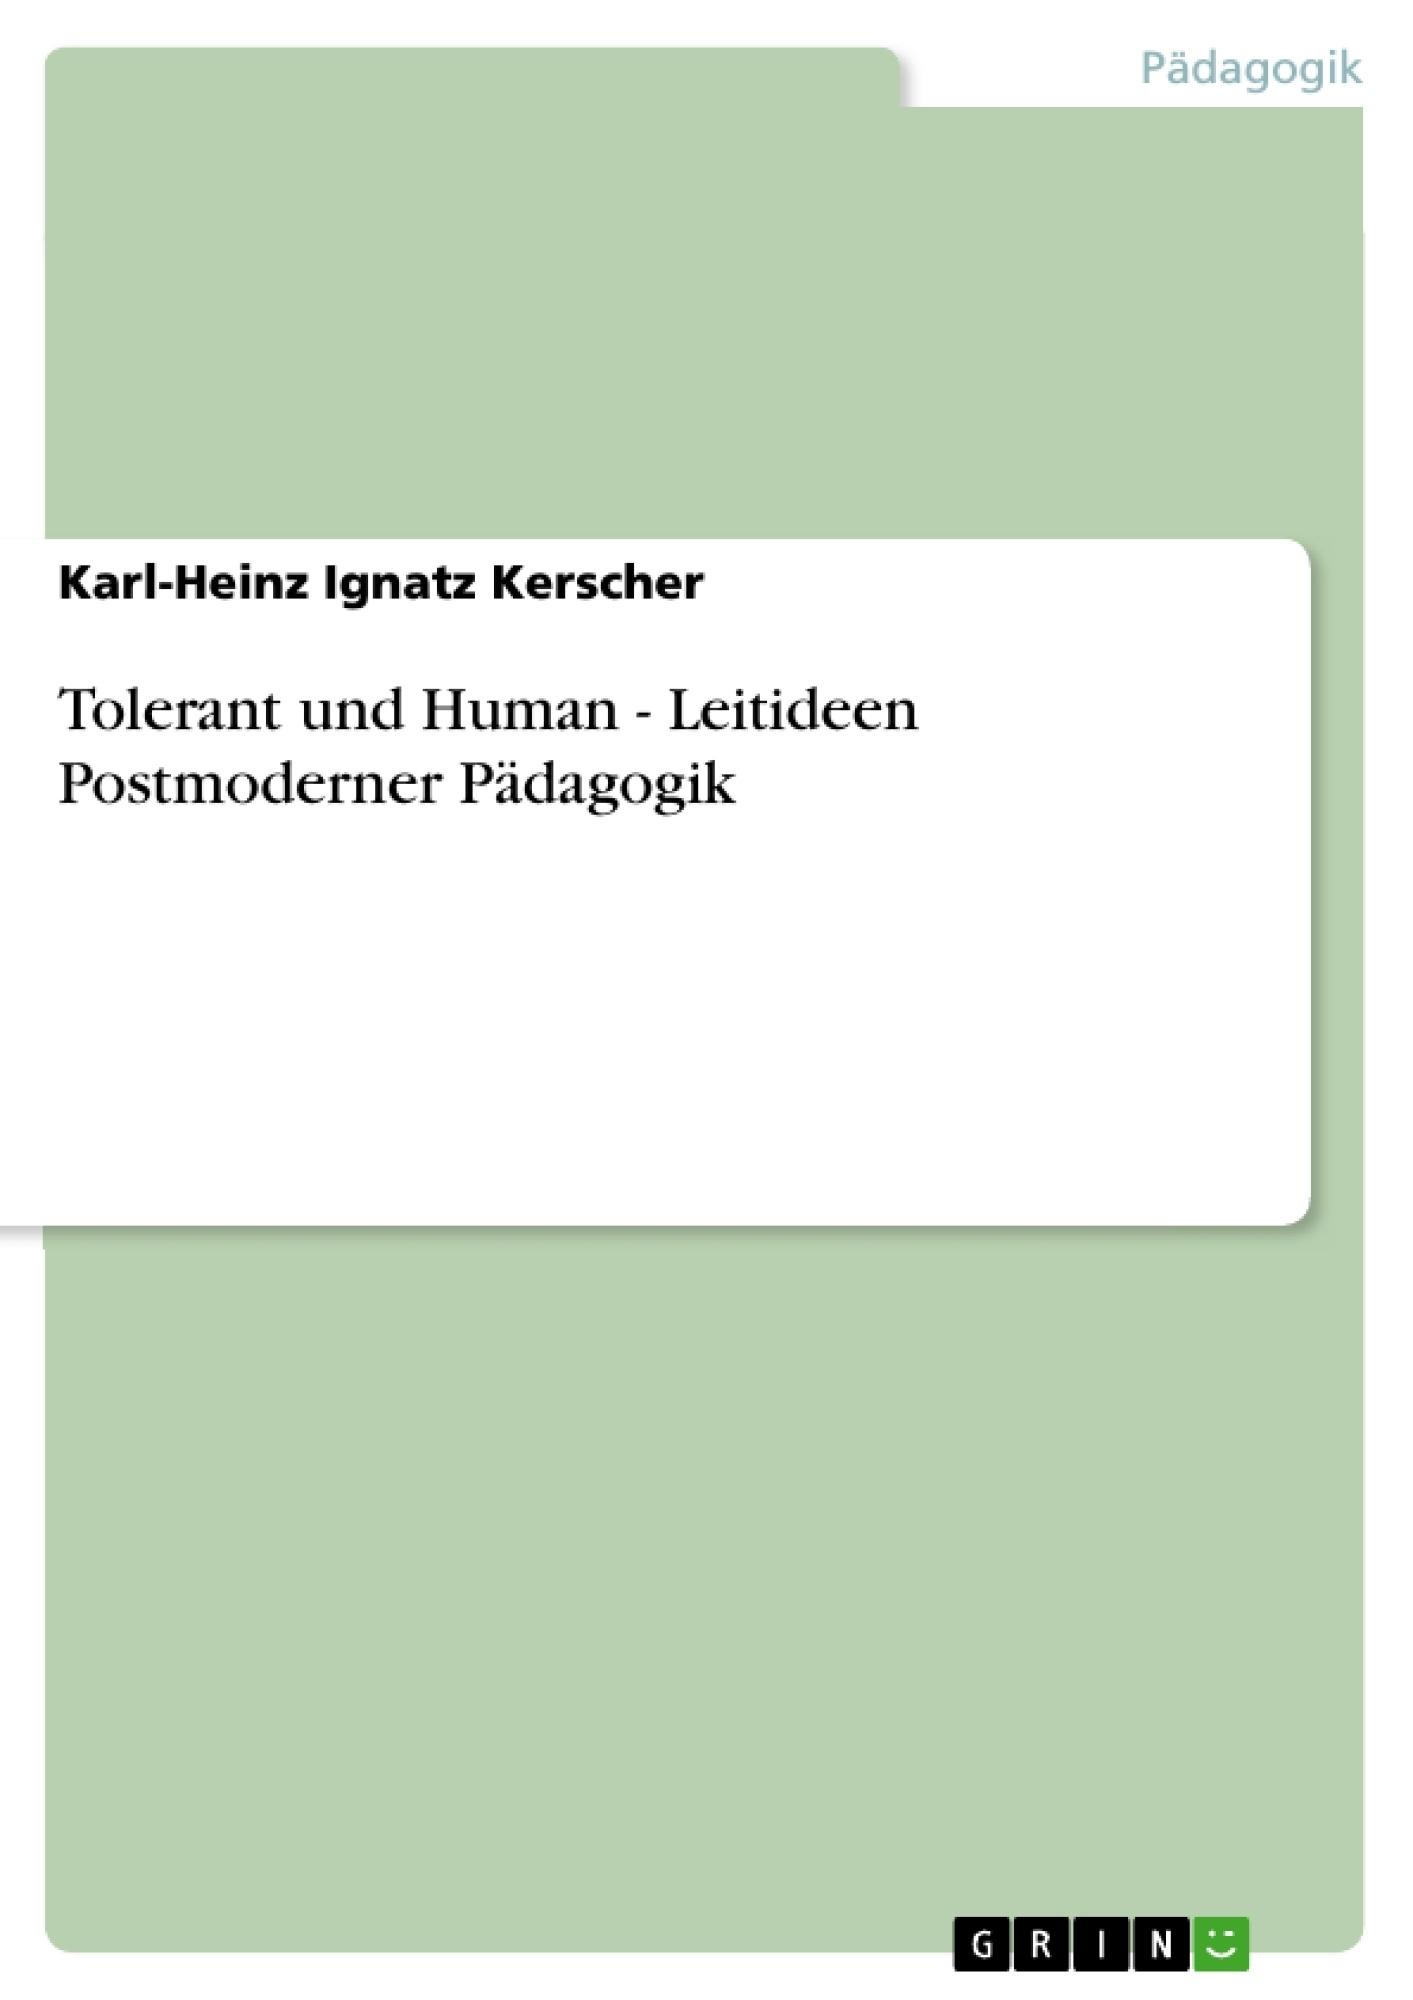 Titel: Tolerant und Human - Leitideen Postmoderner Pädagogik